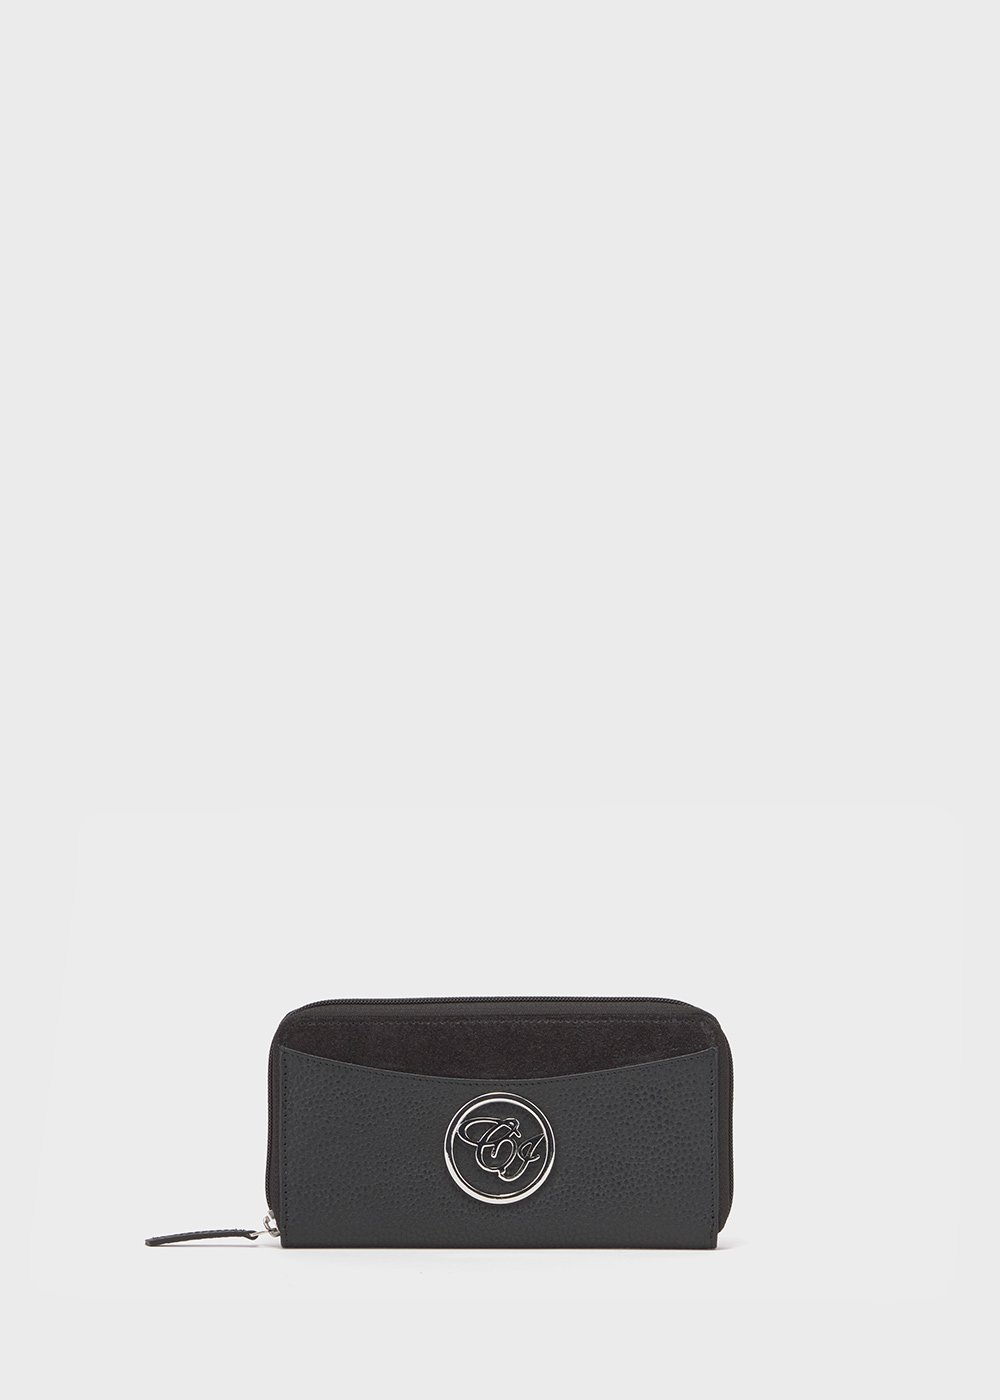 Pier leather wallet - Black - Woman